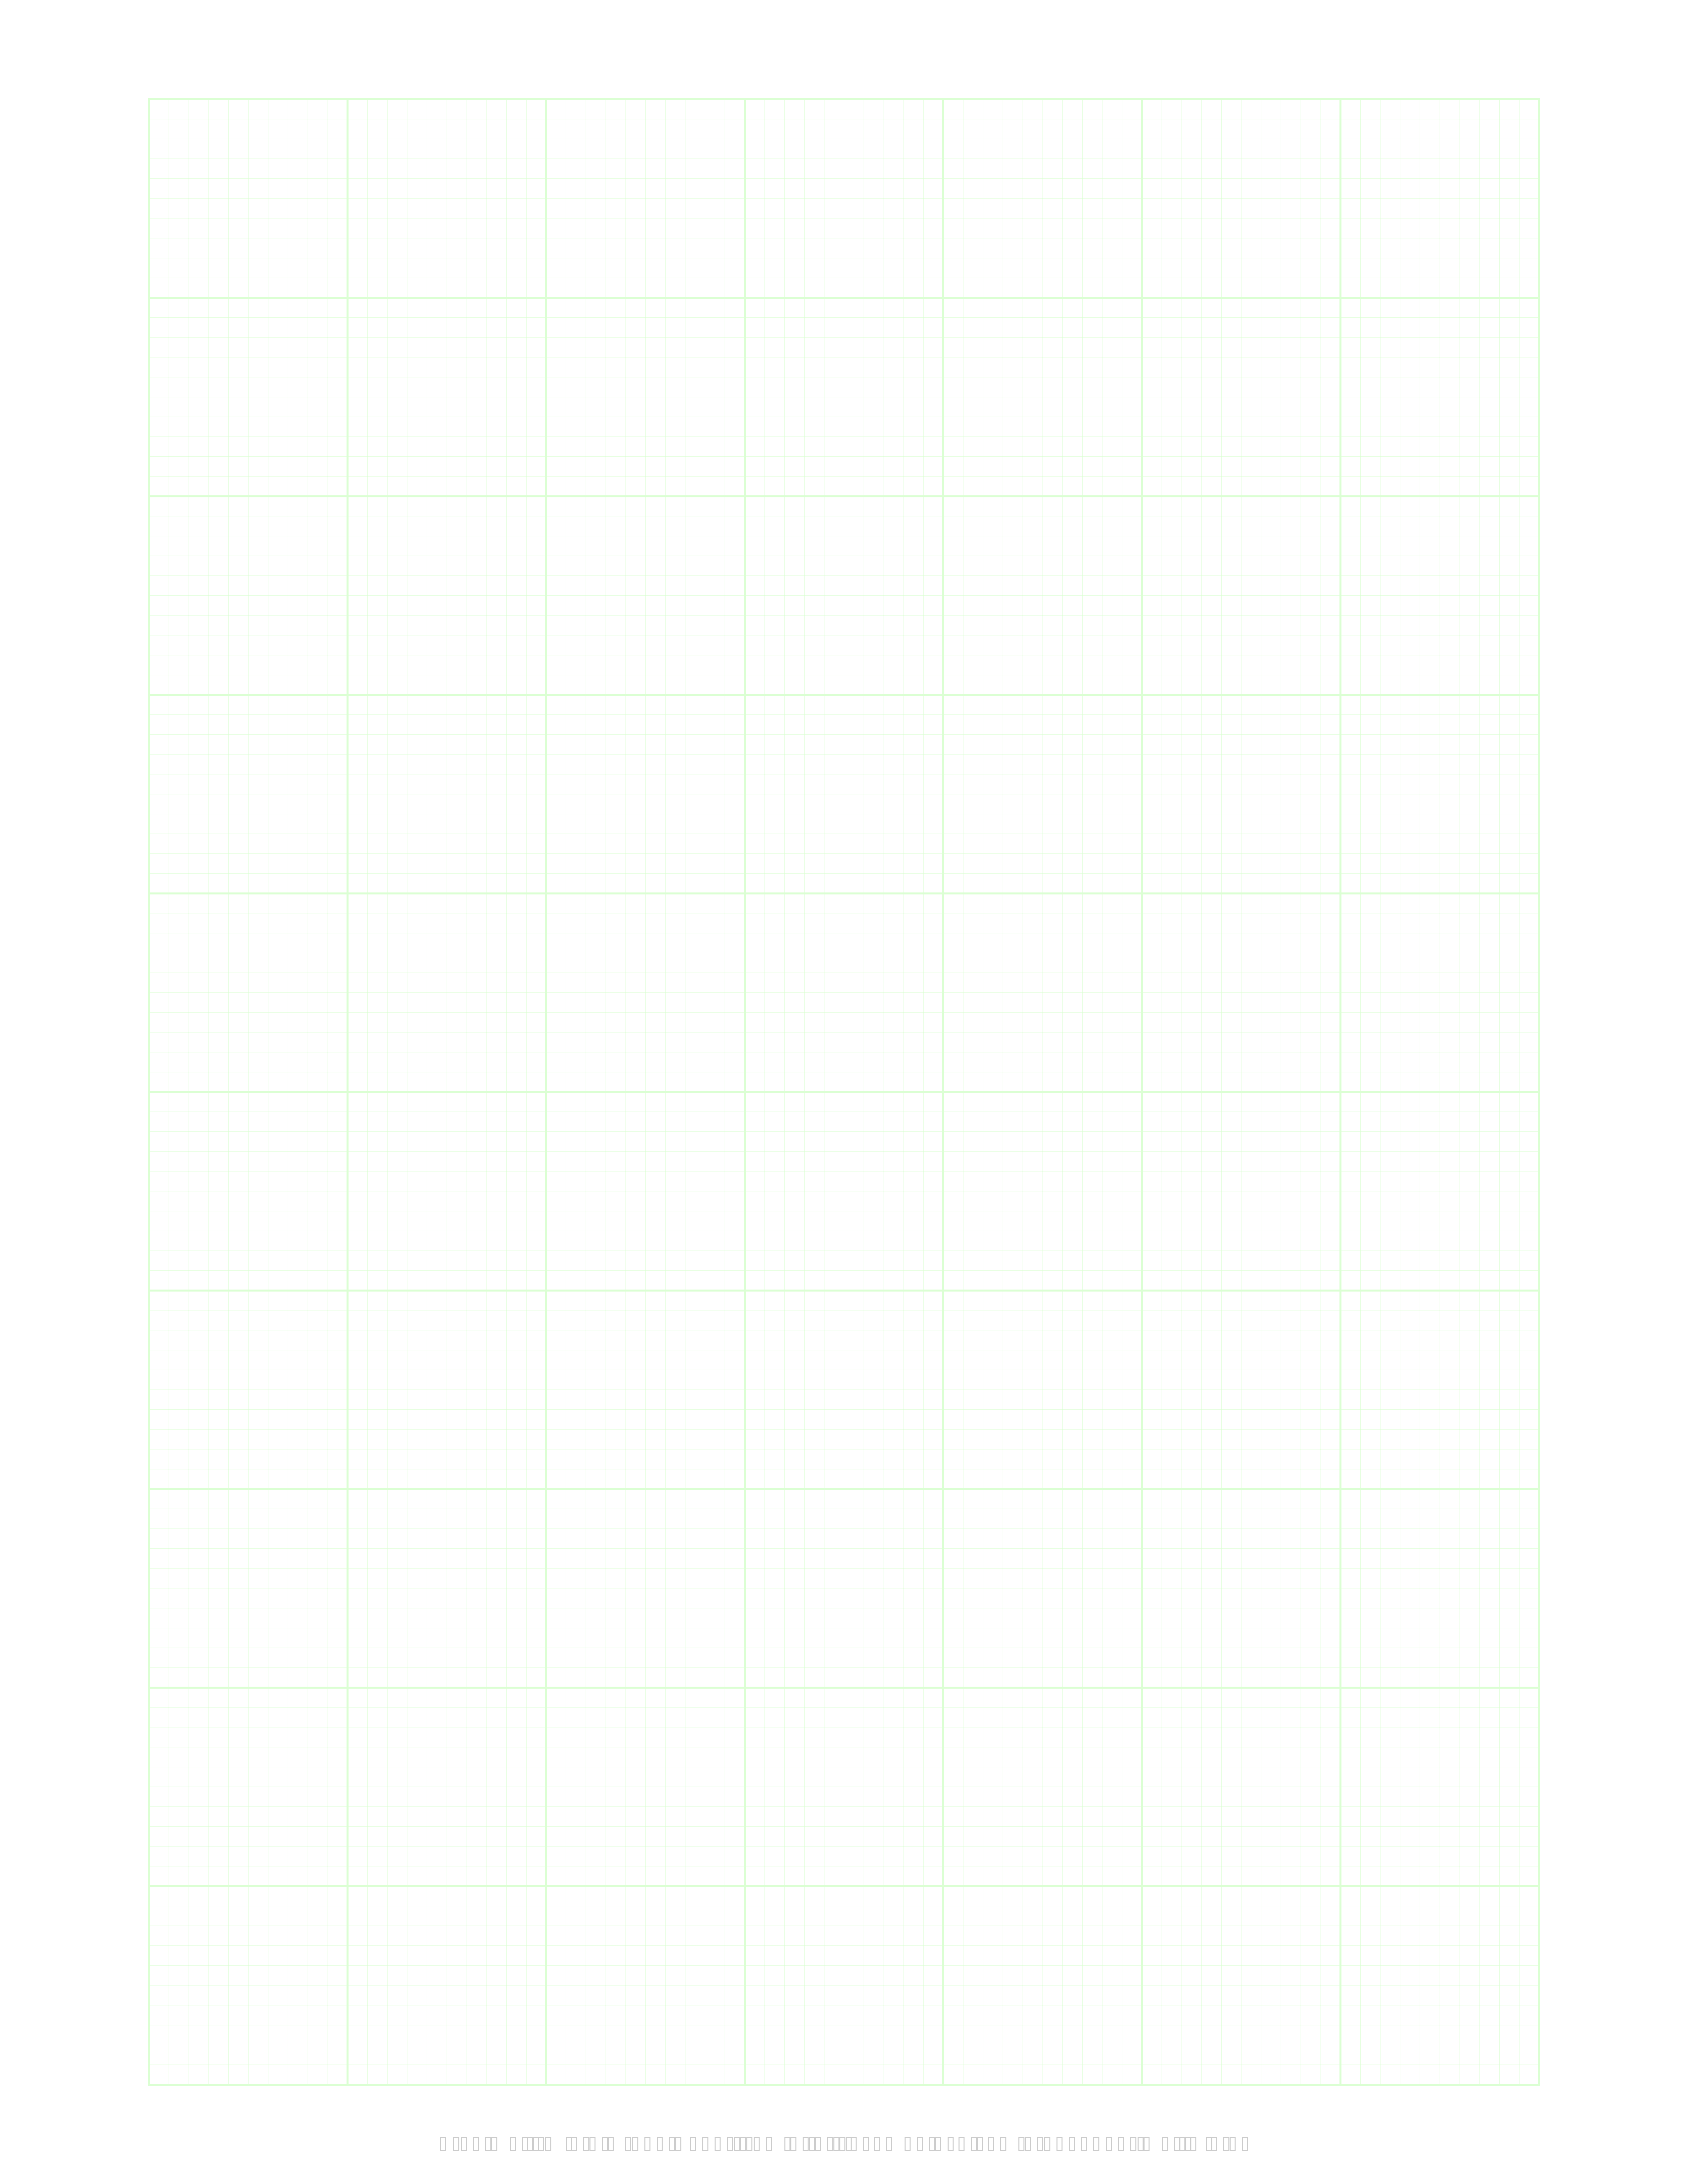 Regular Graph Paper. Grid Paper 1cm Square,Printable Graph Paper 1 ...